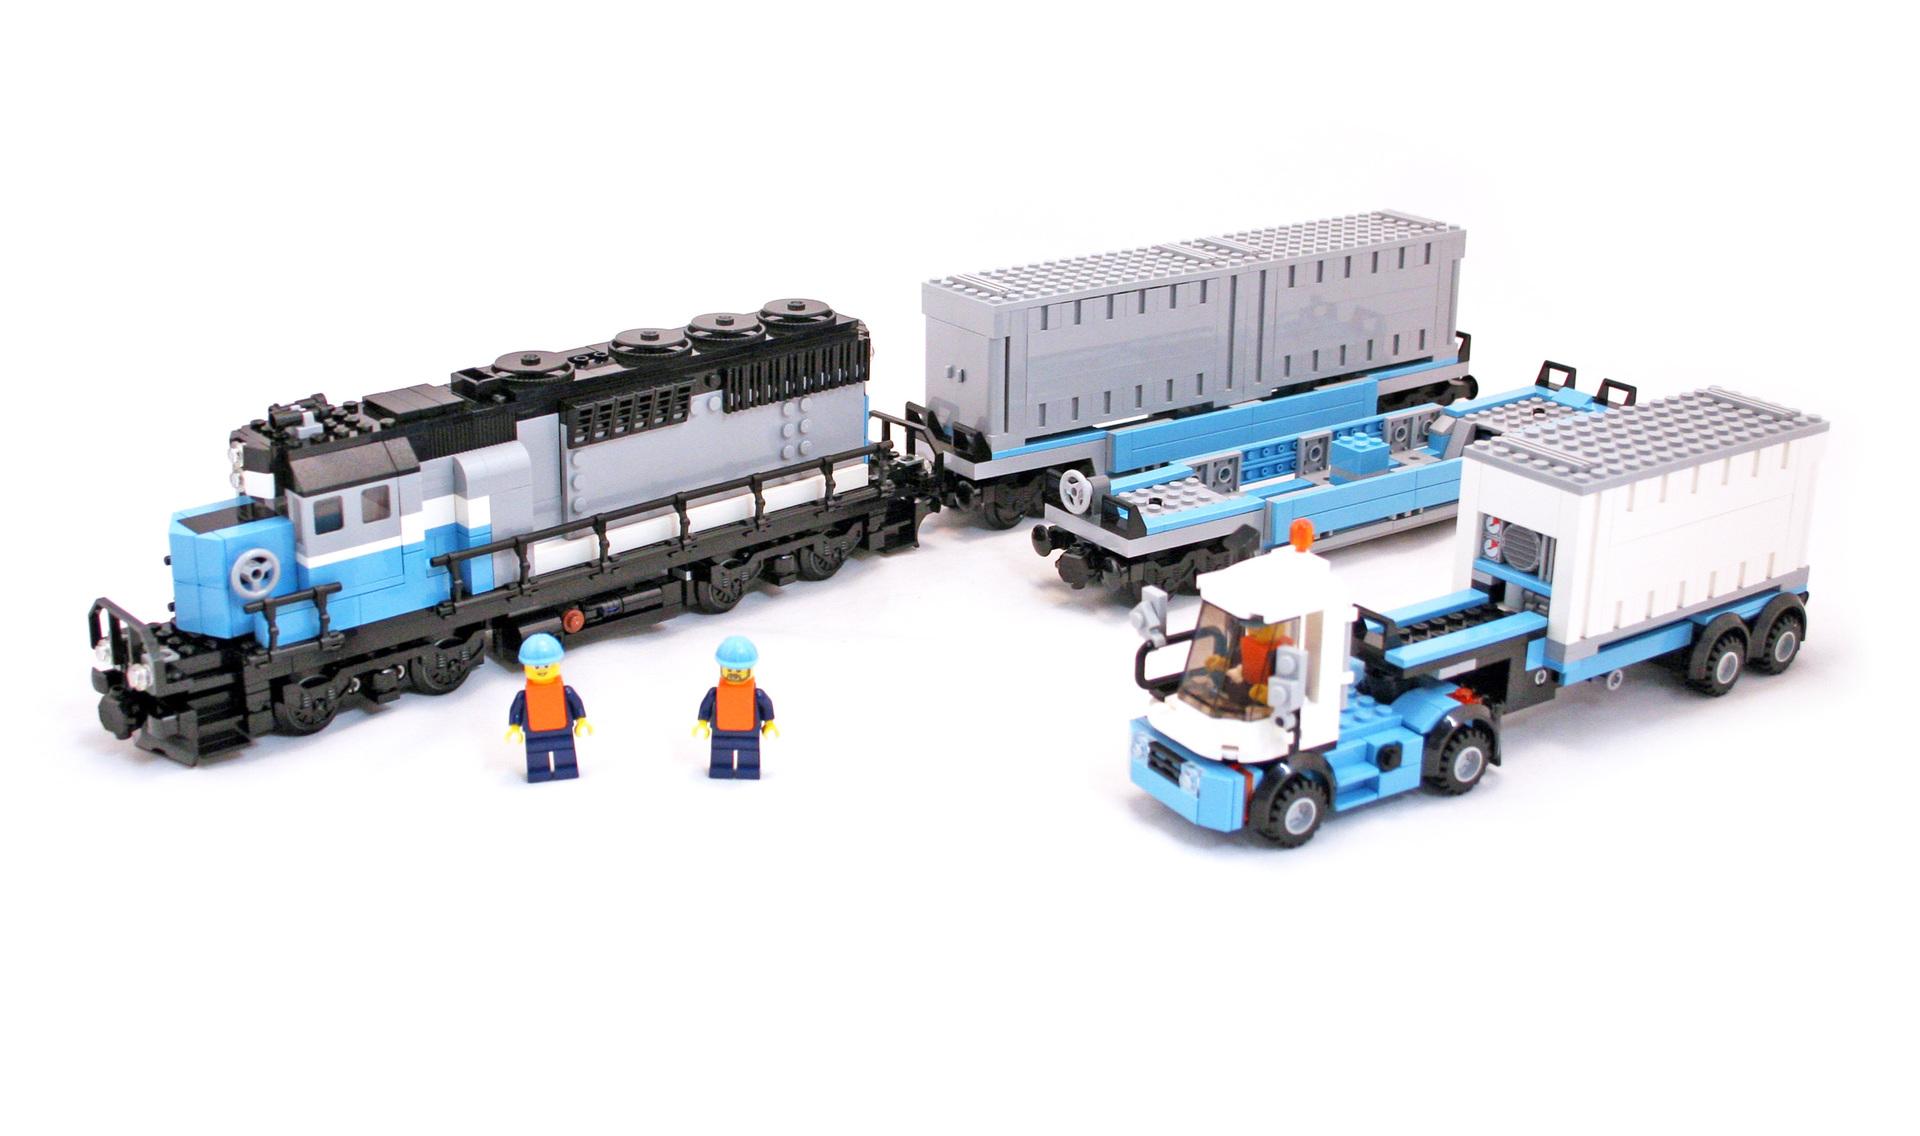 Maersk Train - LEGO set #10219-1 (Building Sets > City)